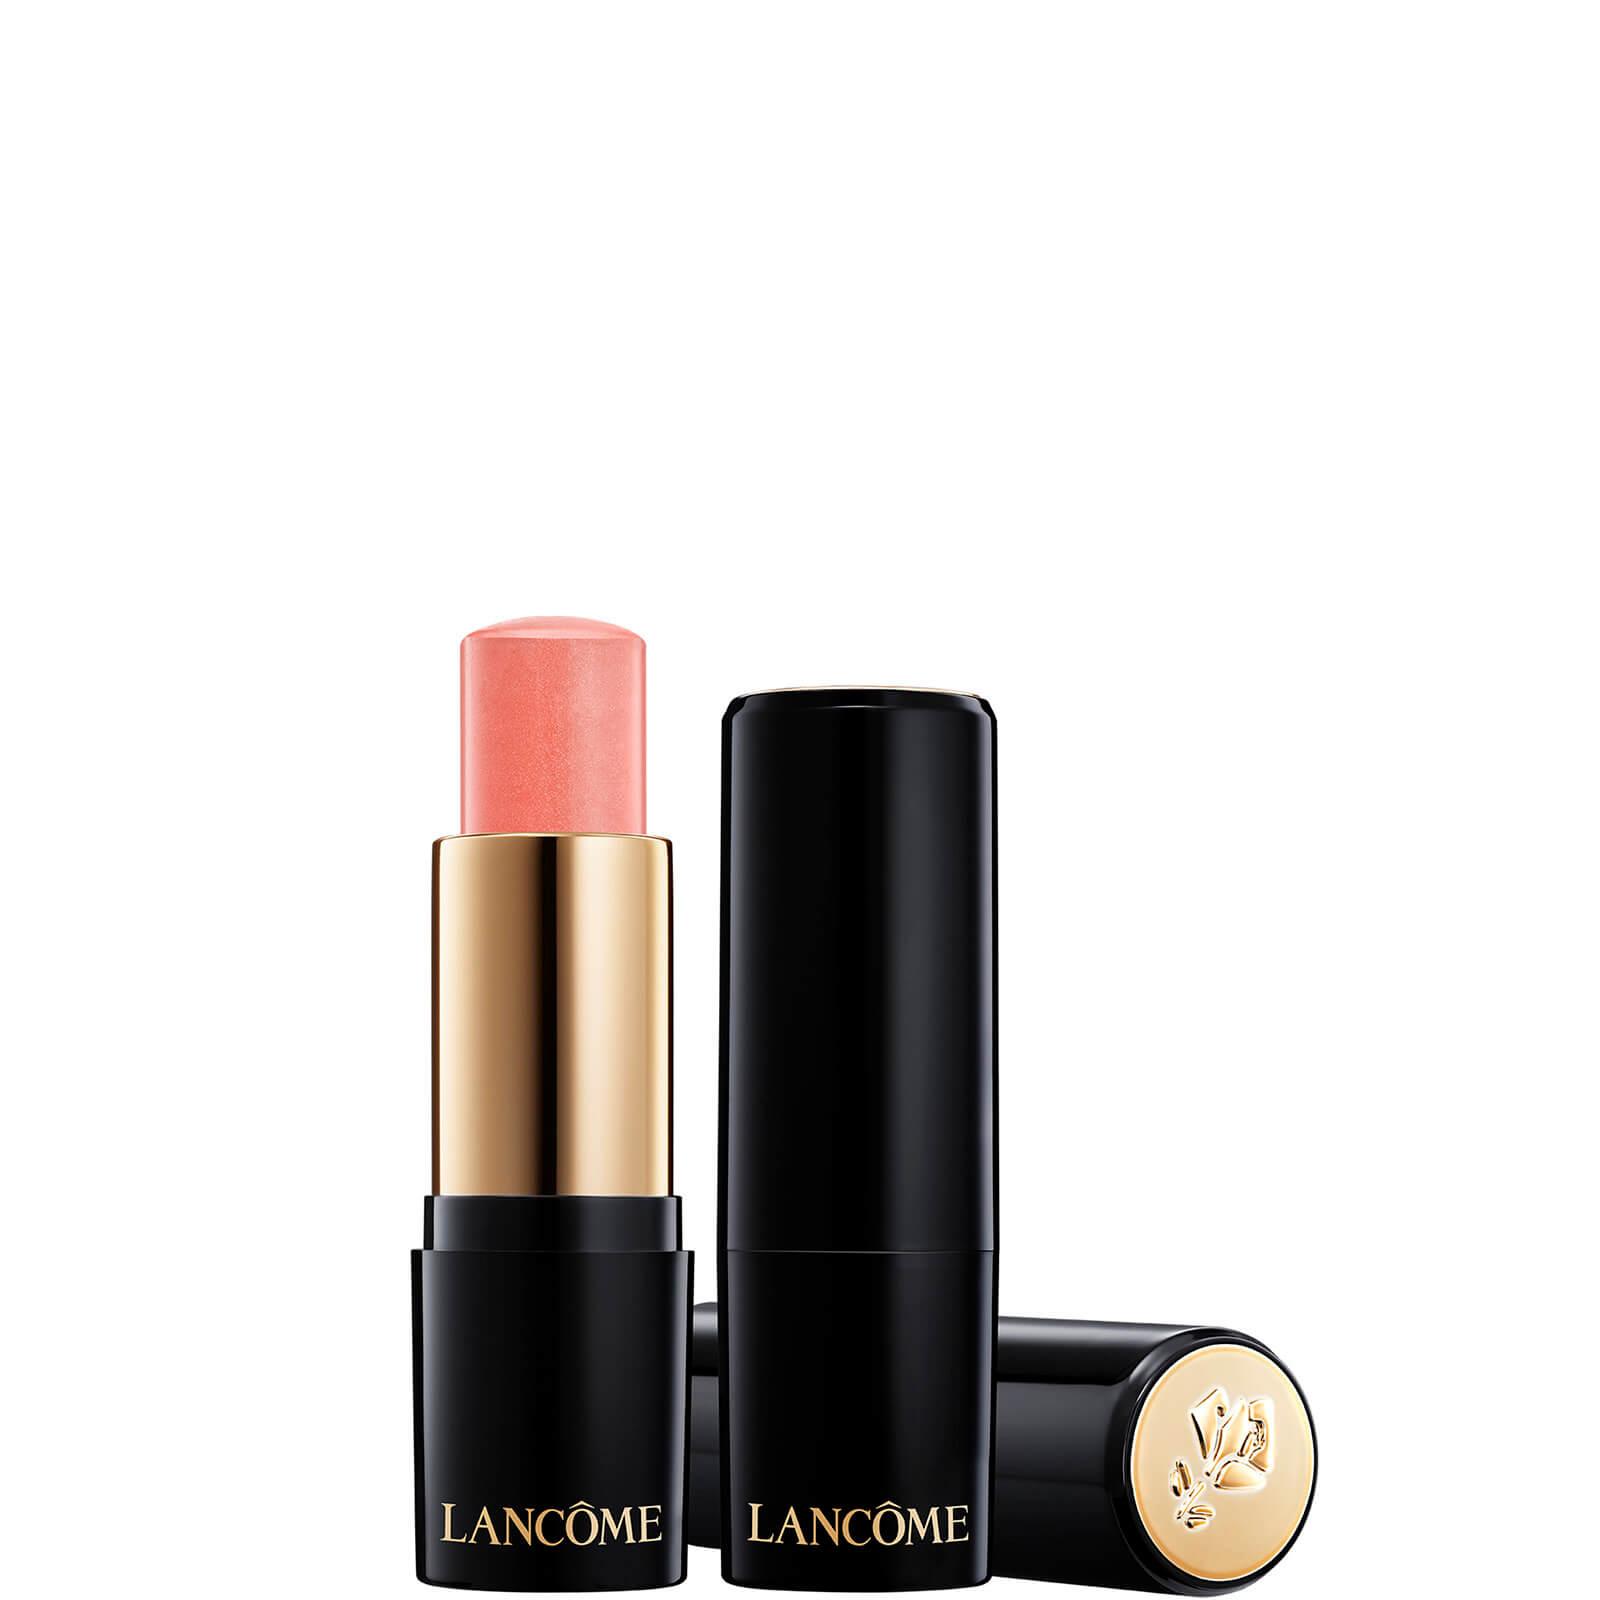 Image of Blush in Stick Teint Idole Ultra Wear Lancôme 9,5g (varie tonalità) - Daring Peach